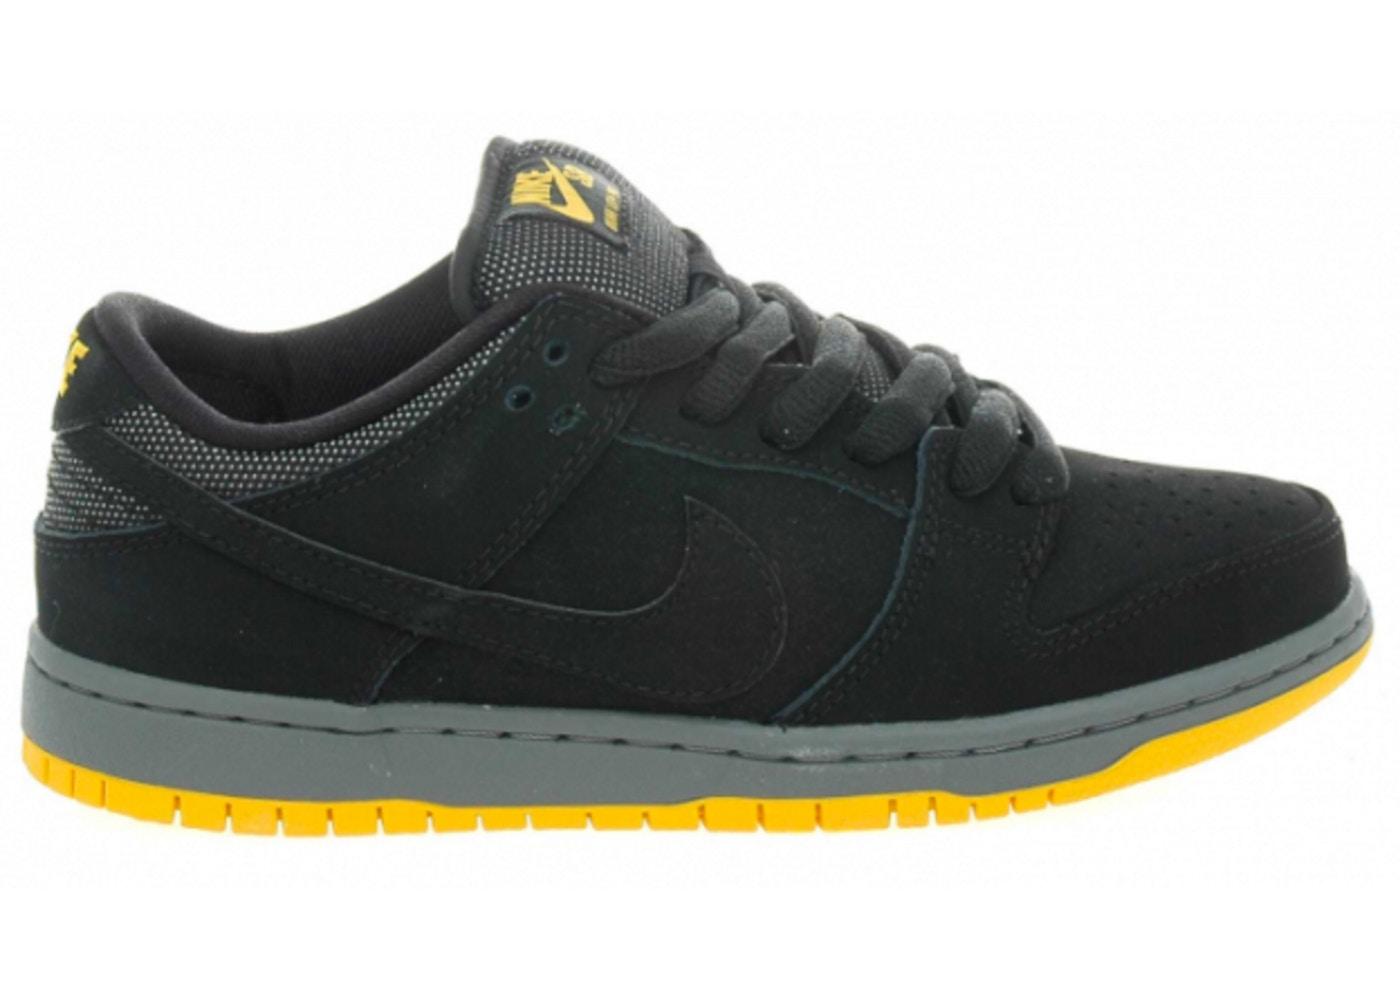 detailed look a4982 e9b5c Nike Dunk SB Low Black University Gold - 304292-046